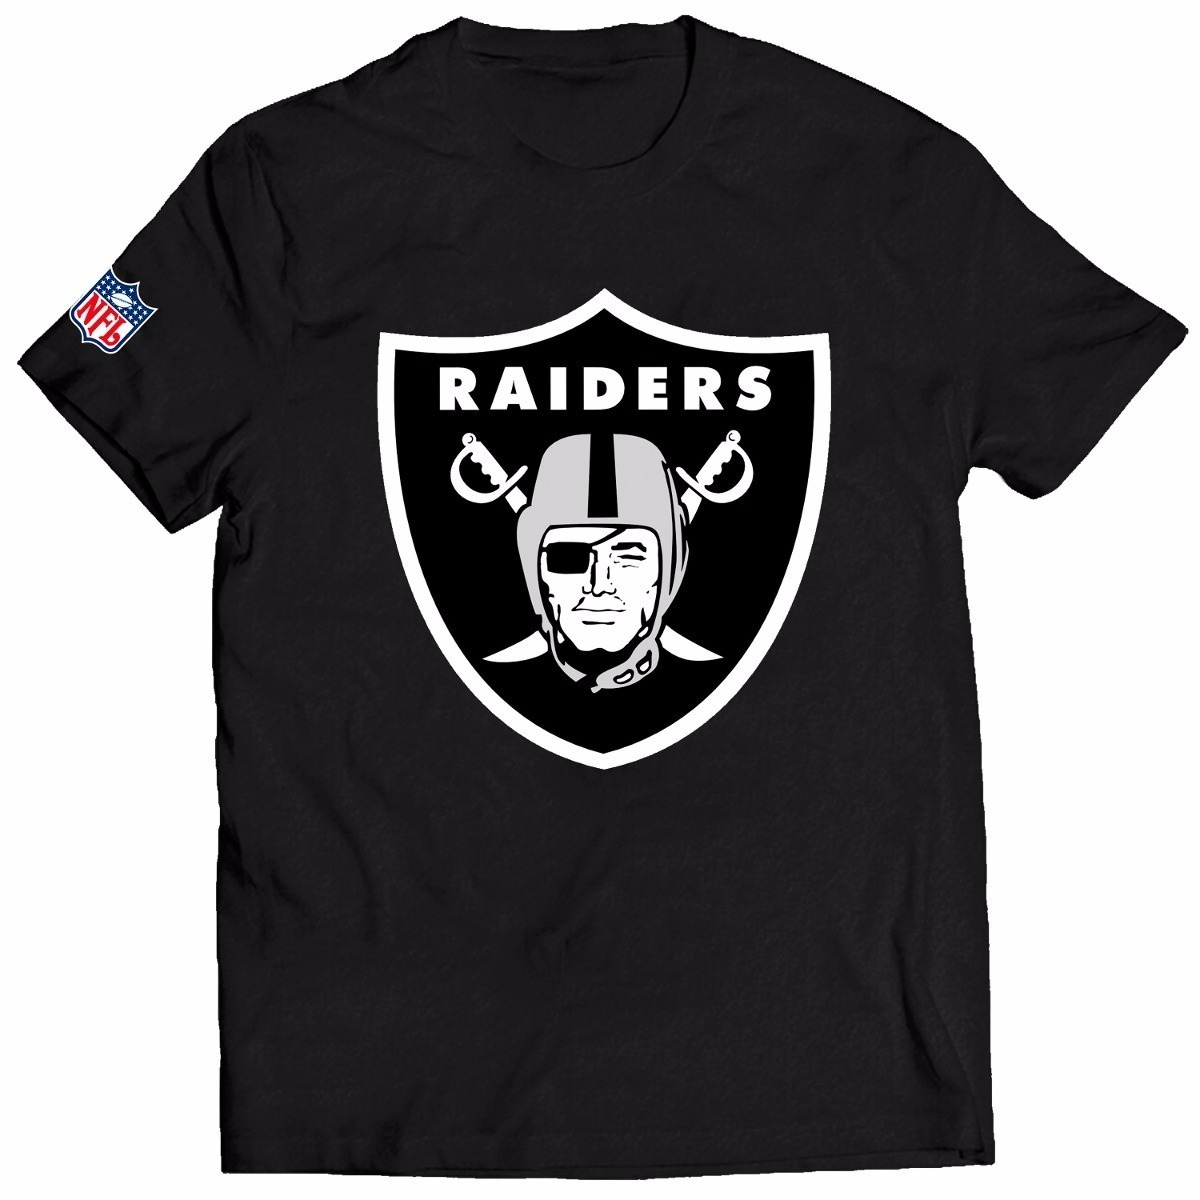 2360a9b8b Camisa Camiseta Oakland Raiders Futebol Americano Nfl - R  39